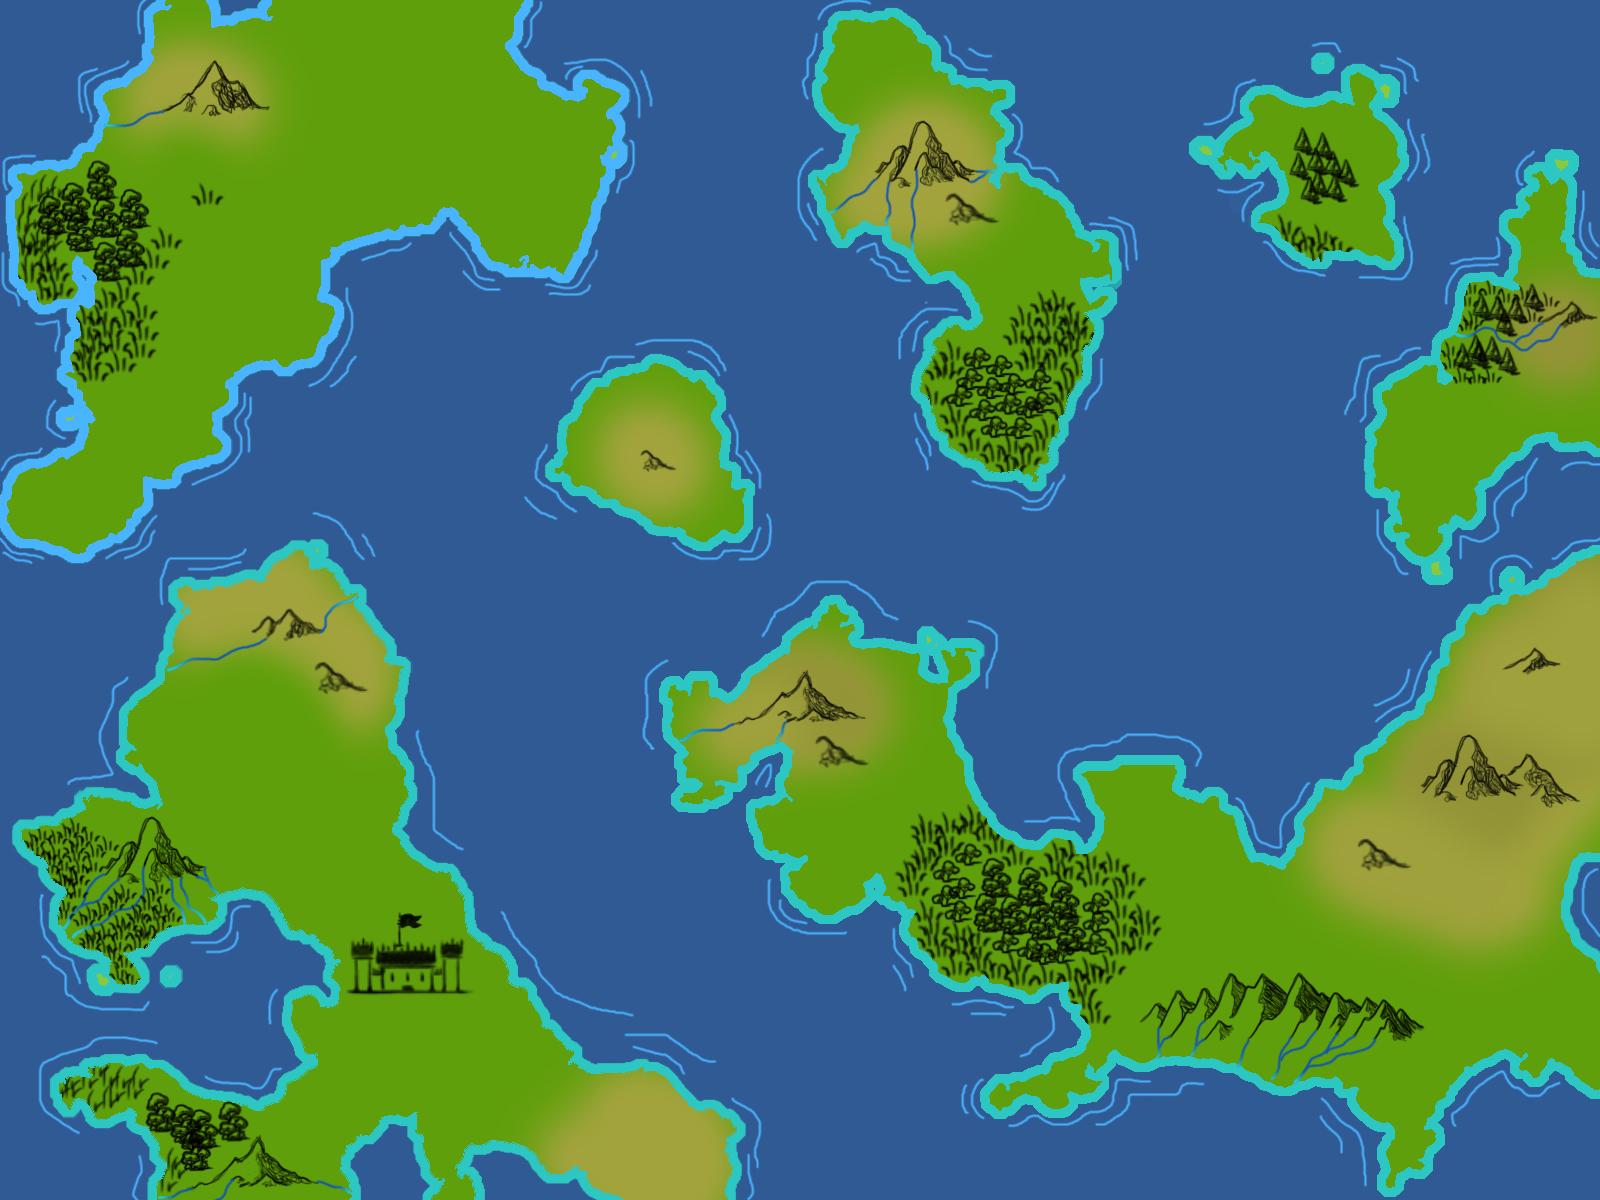 Fantasy World Map | OpenGameArt.org